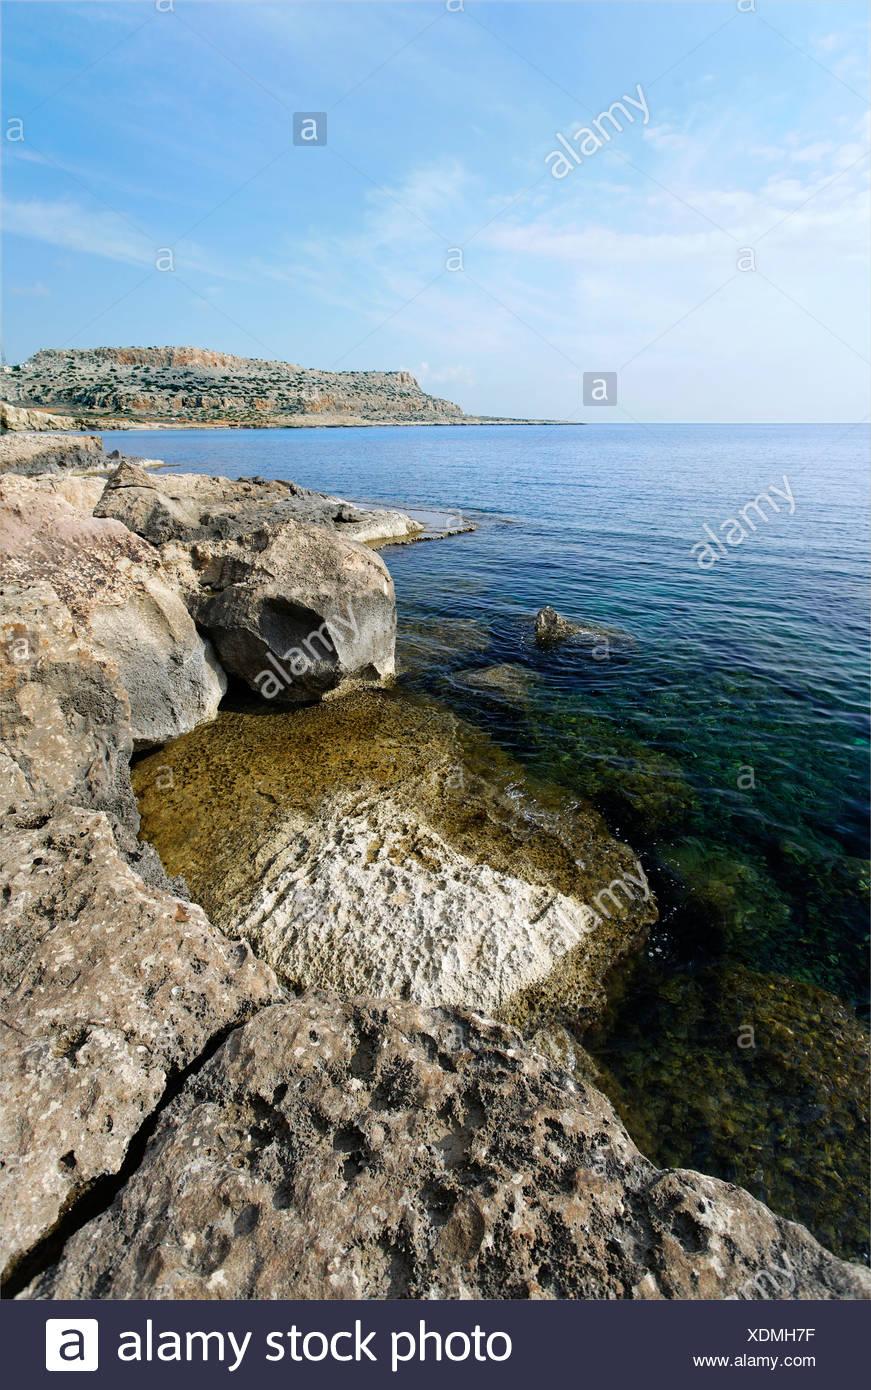 Limestone rocks at Cape Gkreko Peninsula, Larnaca, Cyprus, Mediterranian Sea, Asia - Stock Image